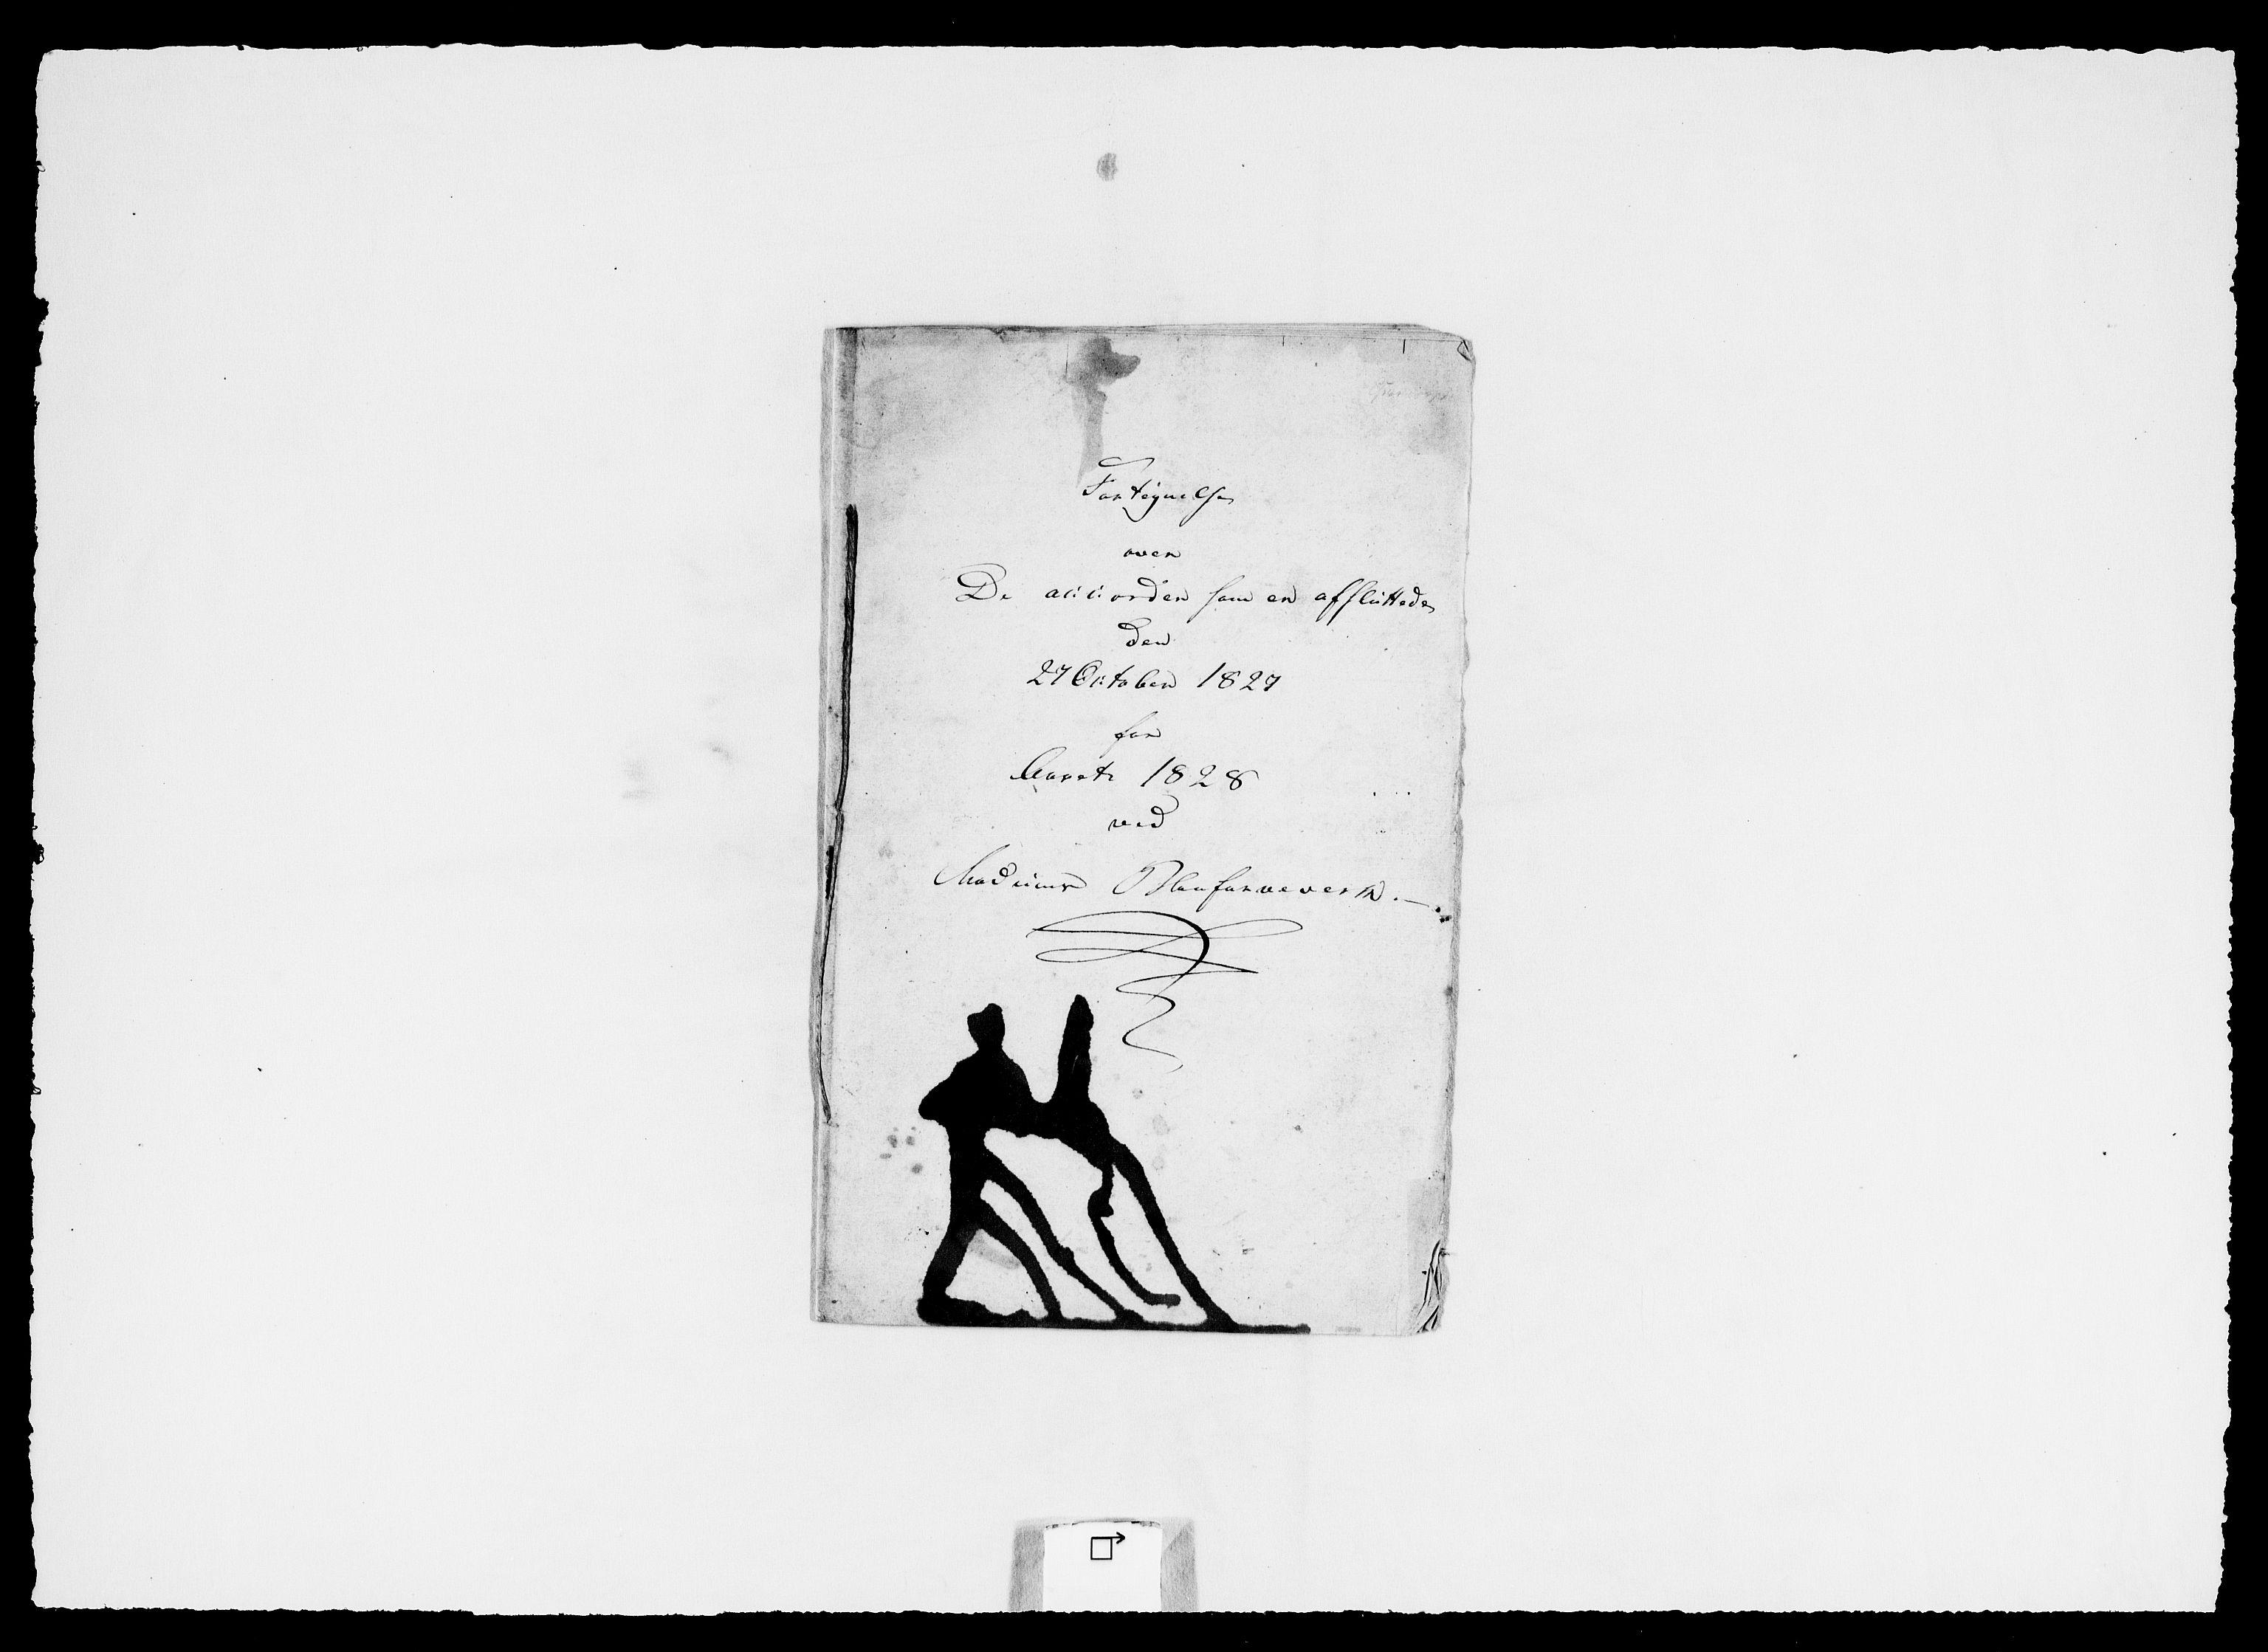 RA, Modums Blaafarveværk, G/Ga/L0063, 1827-1849, s. 12